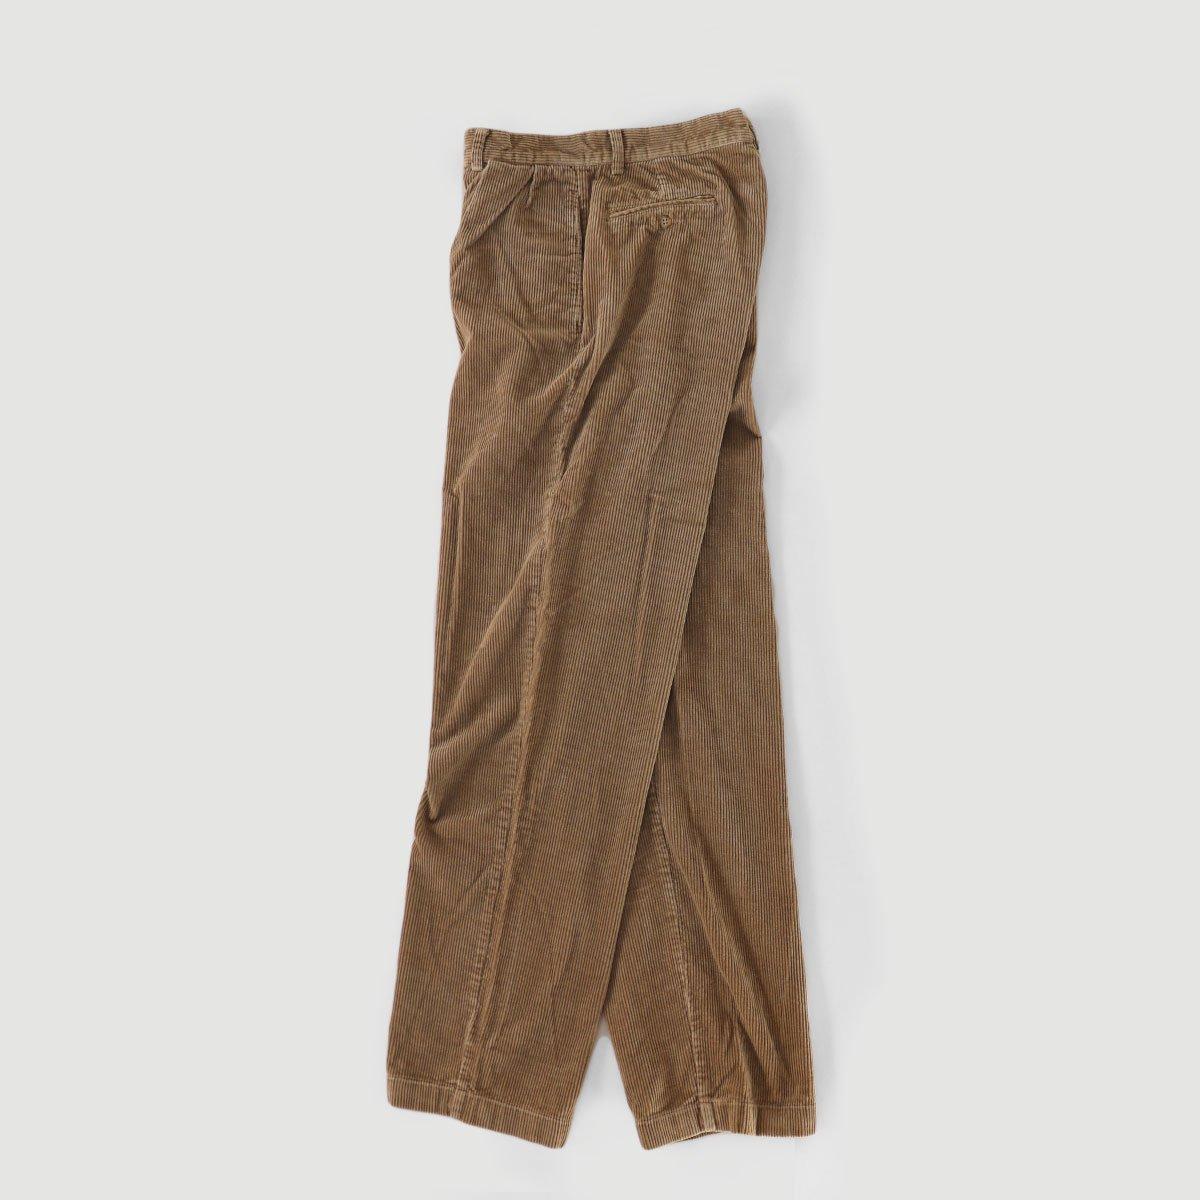 POLO RALPH LAUREN CORDUROY PANTS 詳細画像2